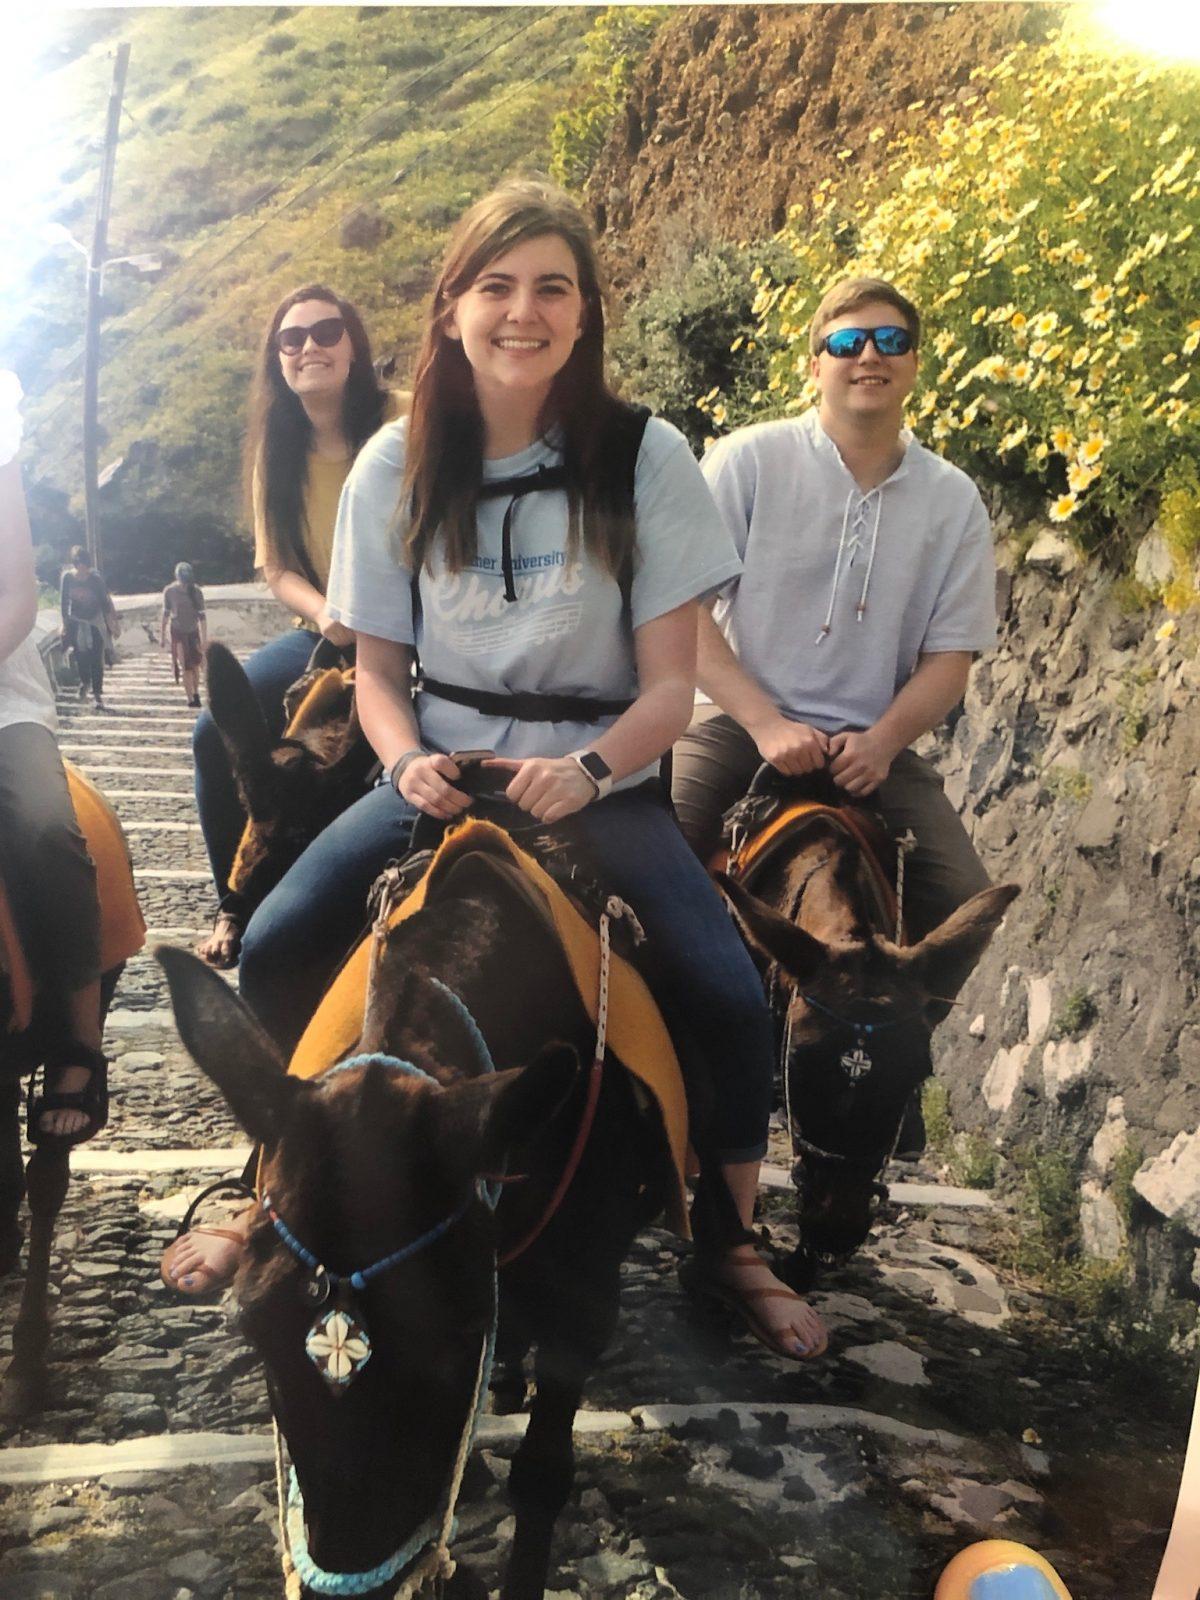 Students ride donkeys in Santorini, Greece.